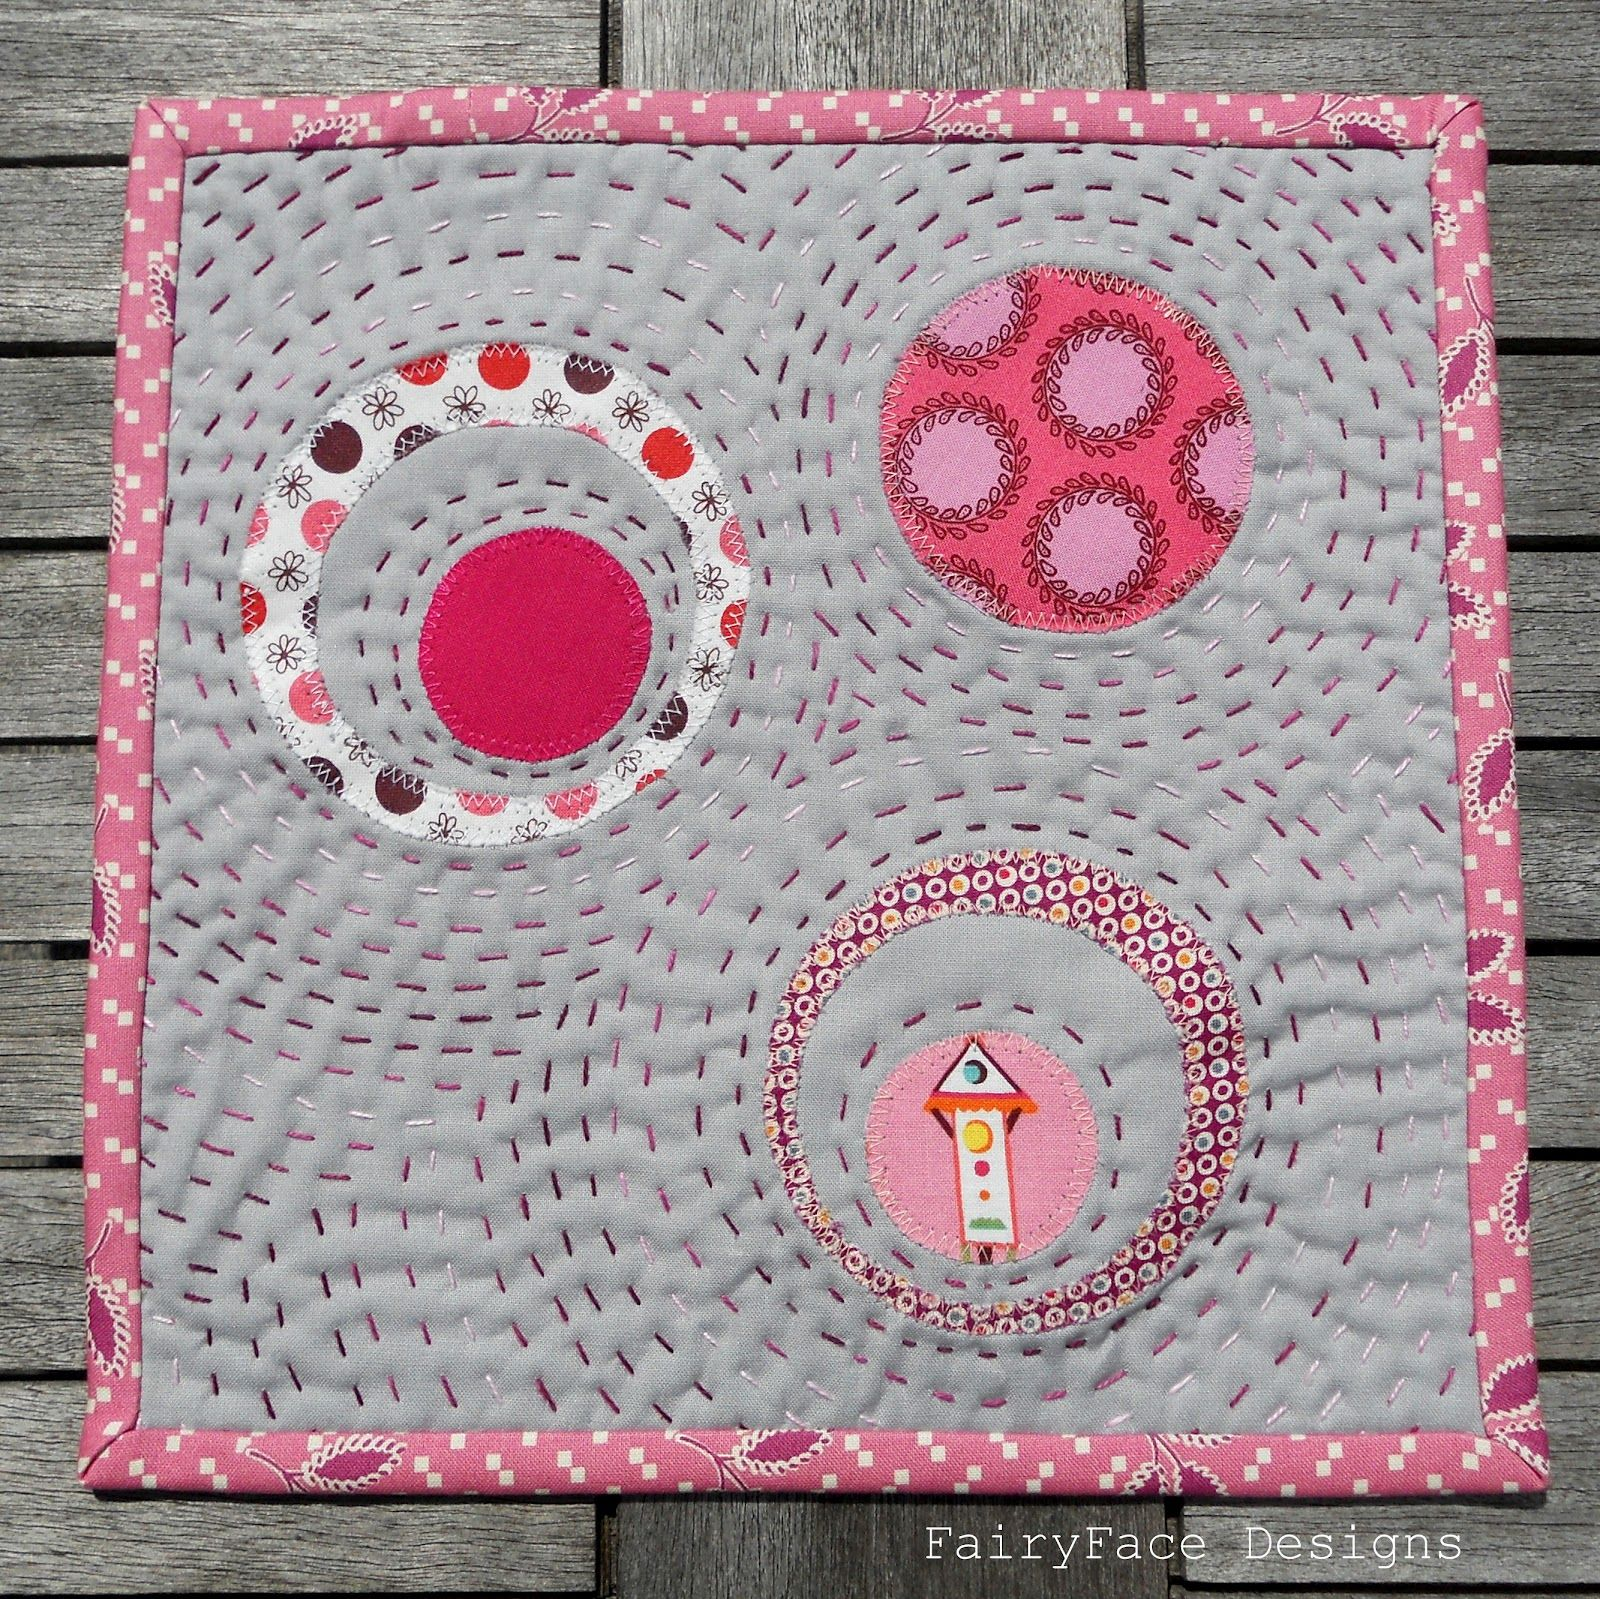 FairyFace Designs Circles Mug Rug Sew Patchwork